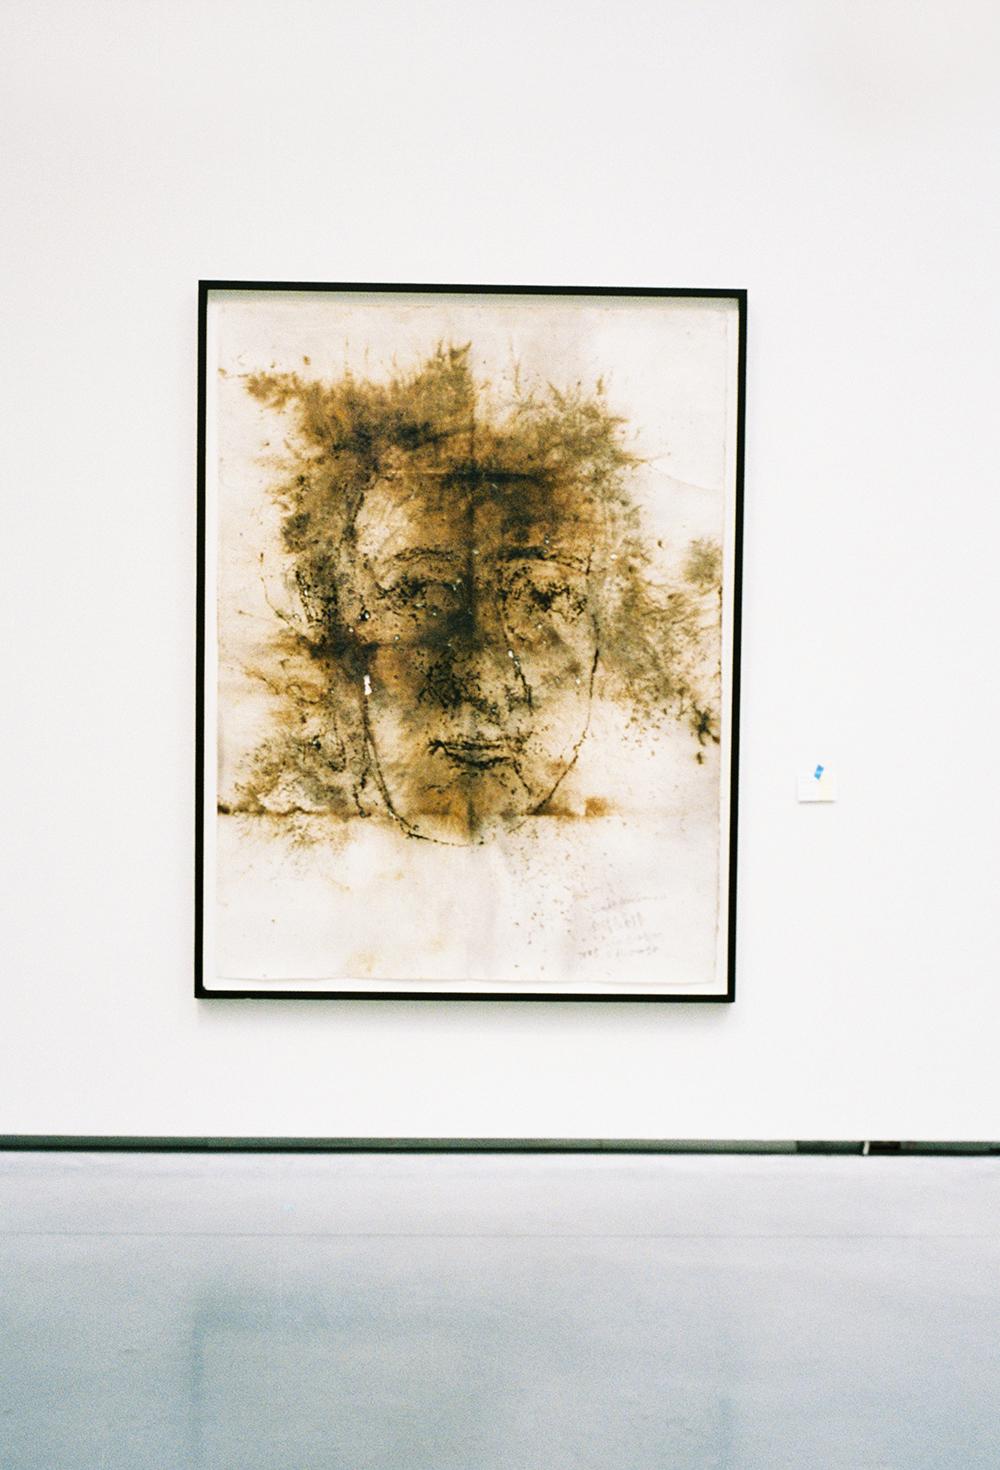 Cai Guo-Qiang: Life Beneath the Shadow: Bluidy Mackenzie (2005)